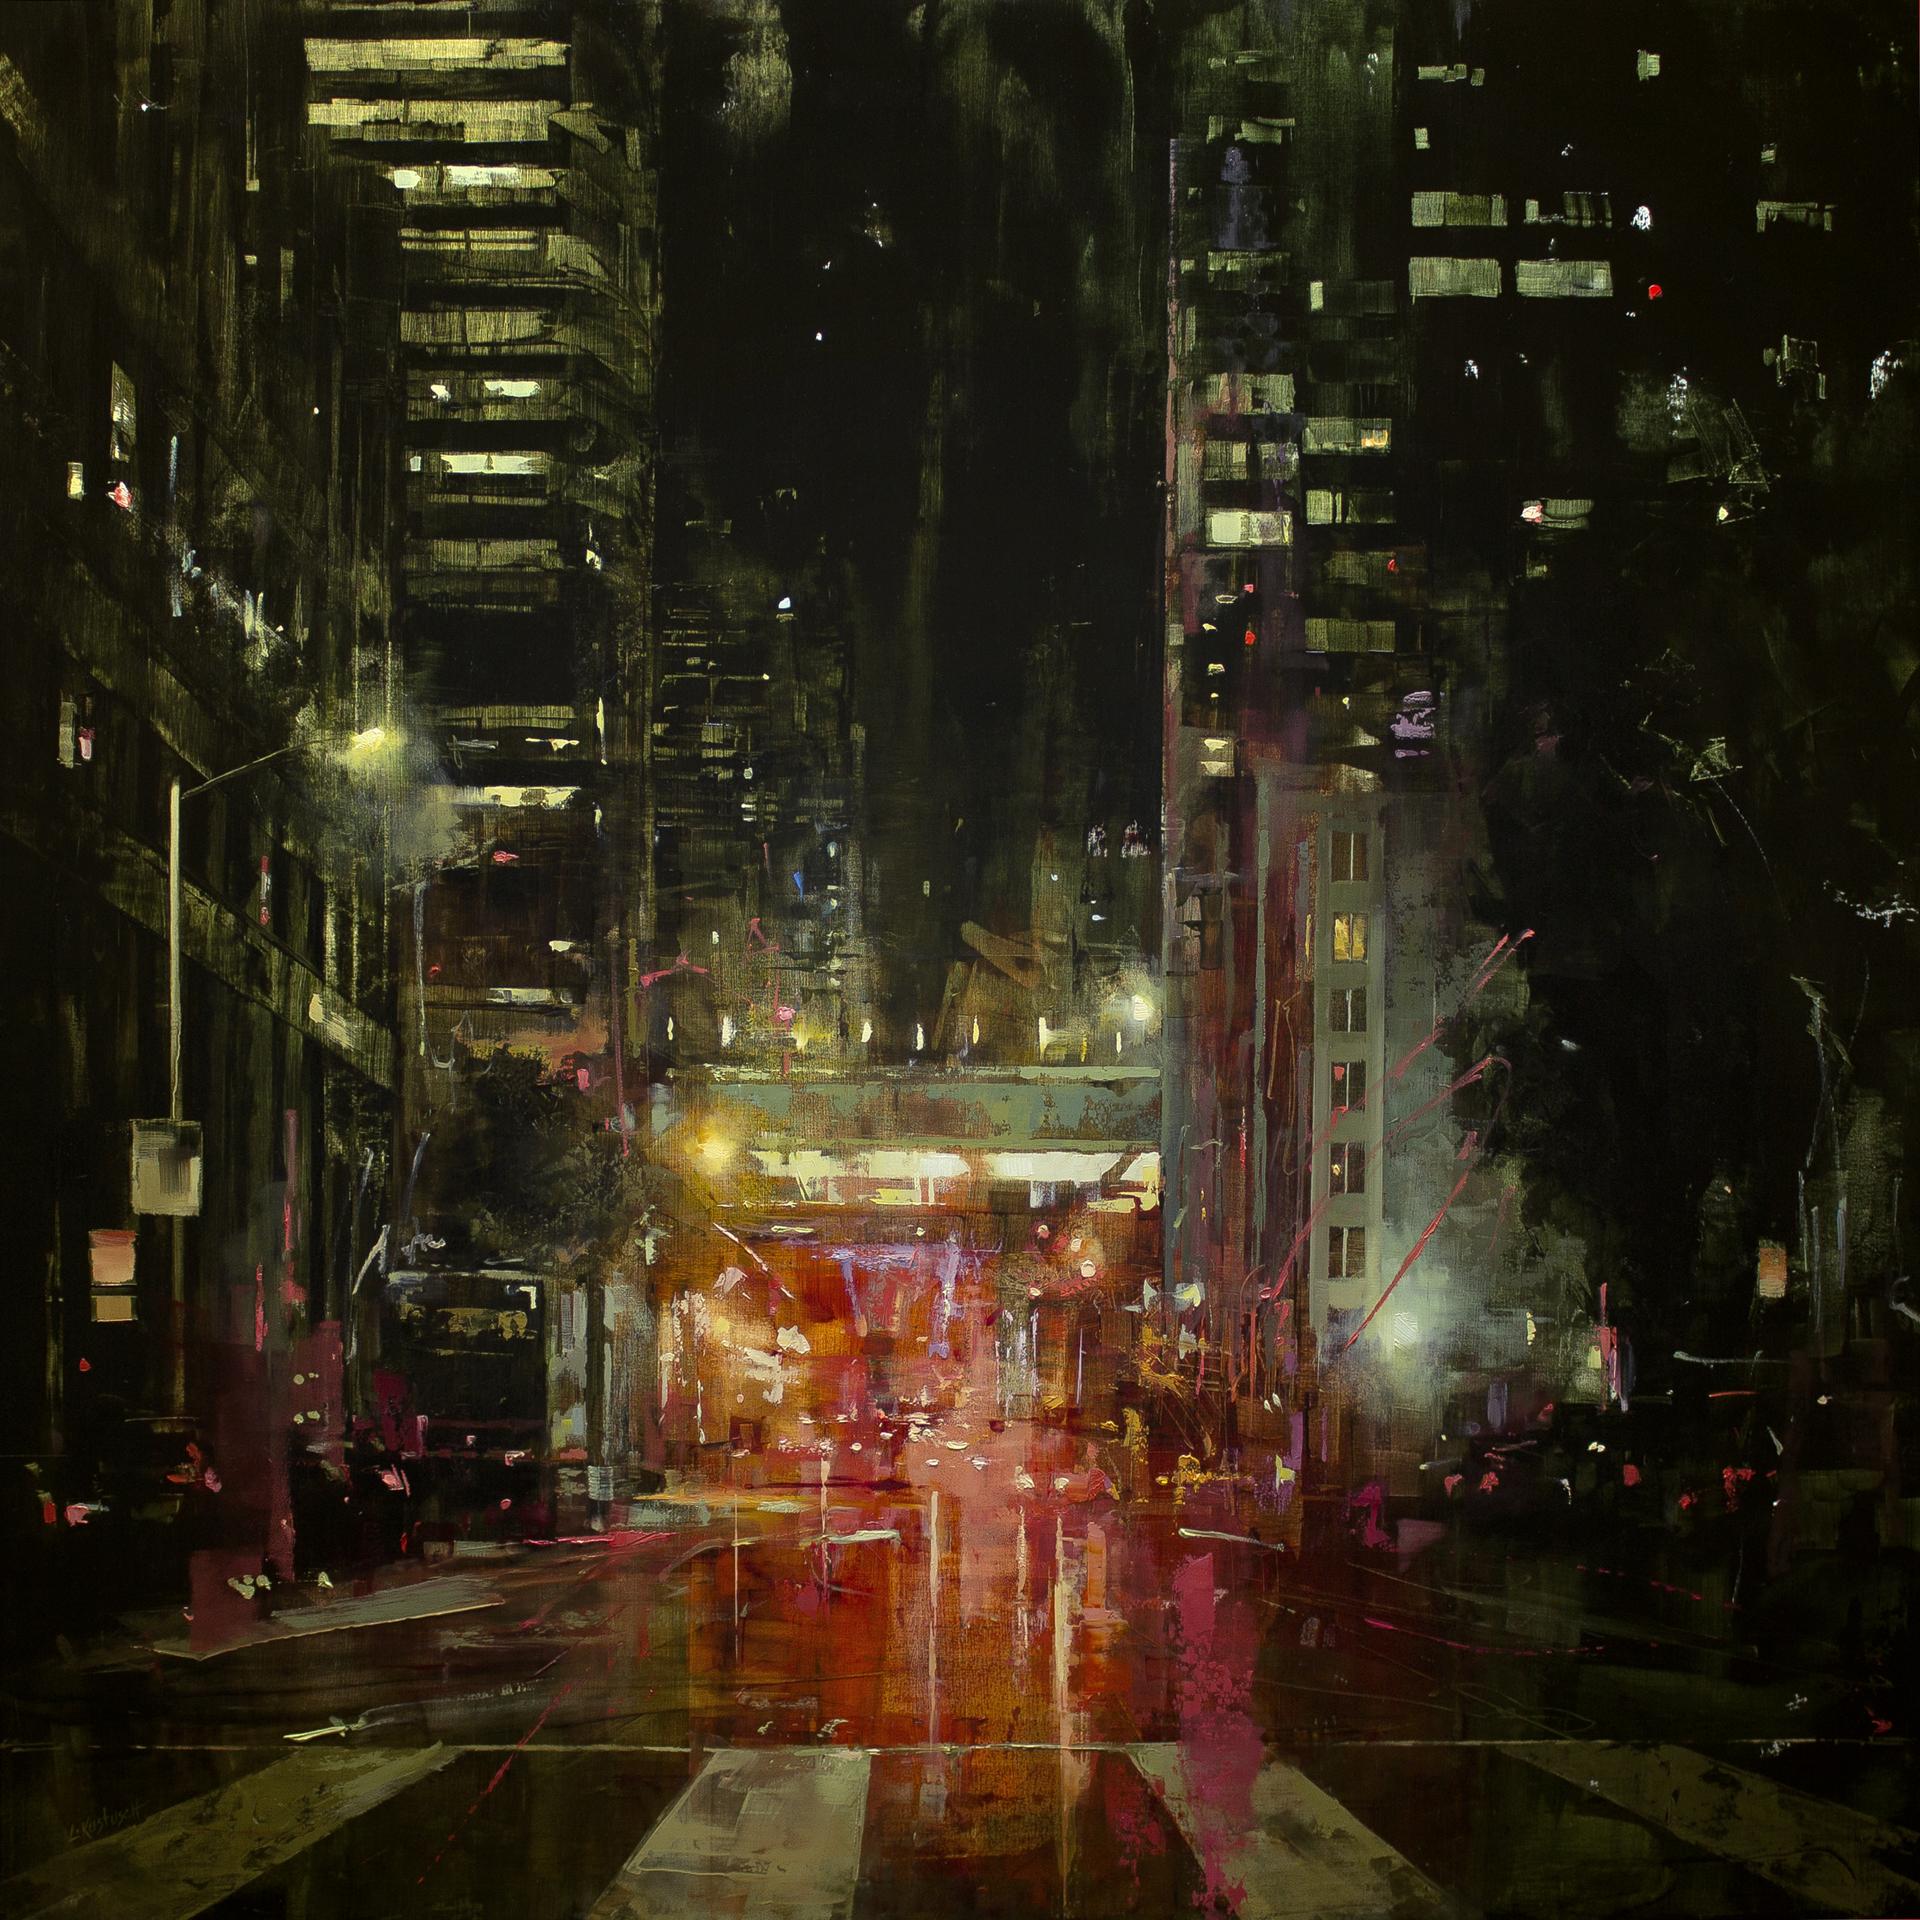 Afterglow by Lindsey Kustusch